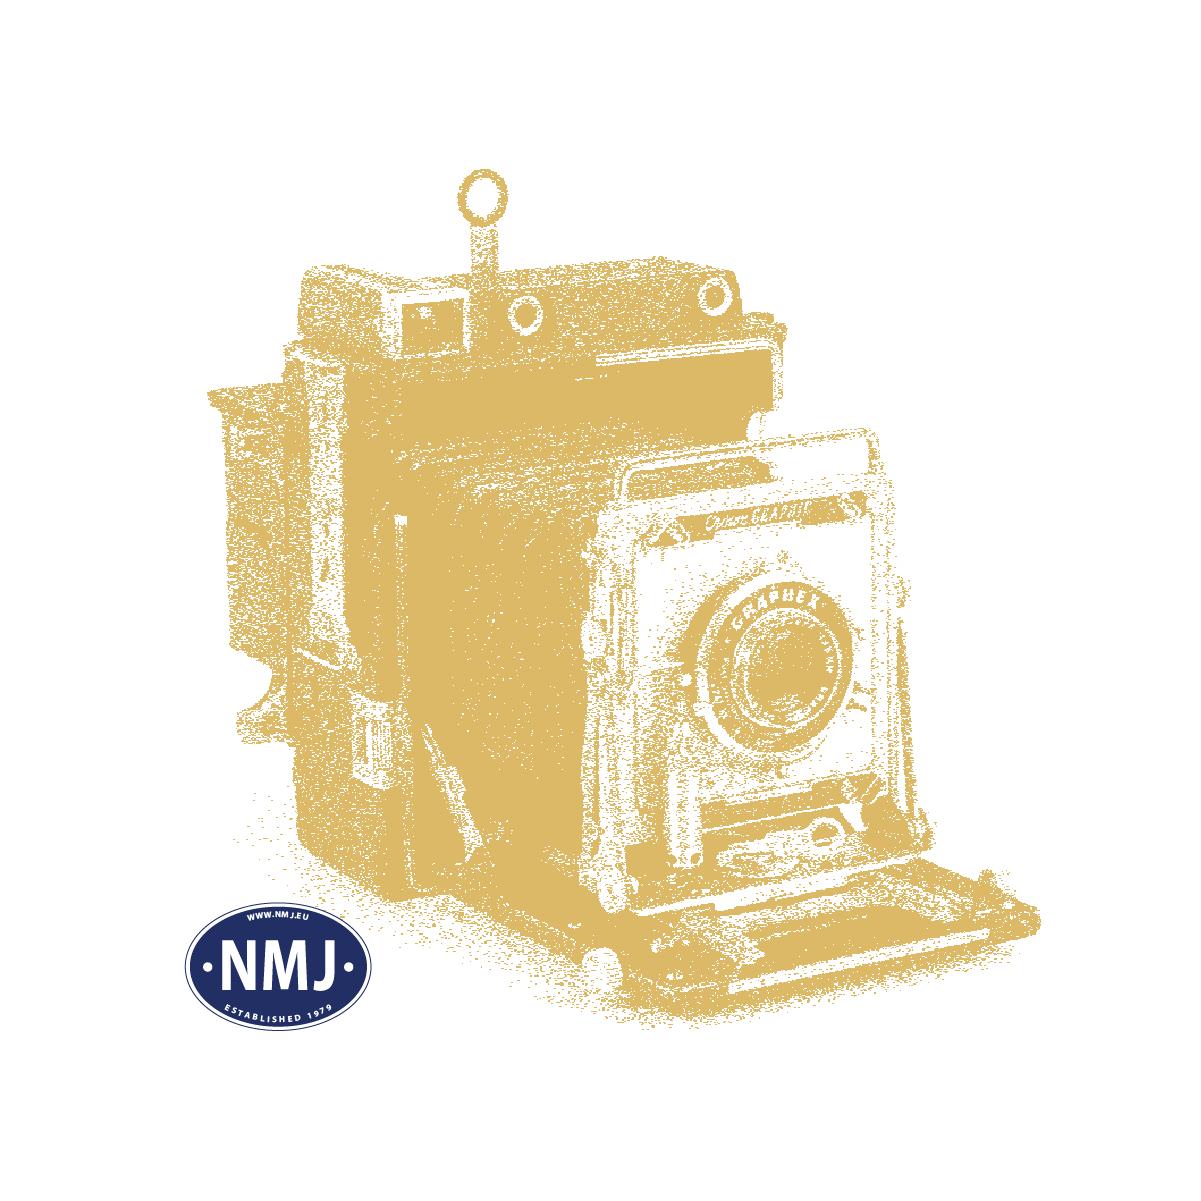 NMJT120.990 - NMJ Topline NSB B7-series Interior Light Set DC/DCC